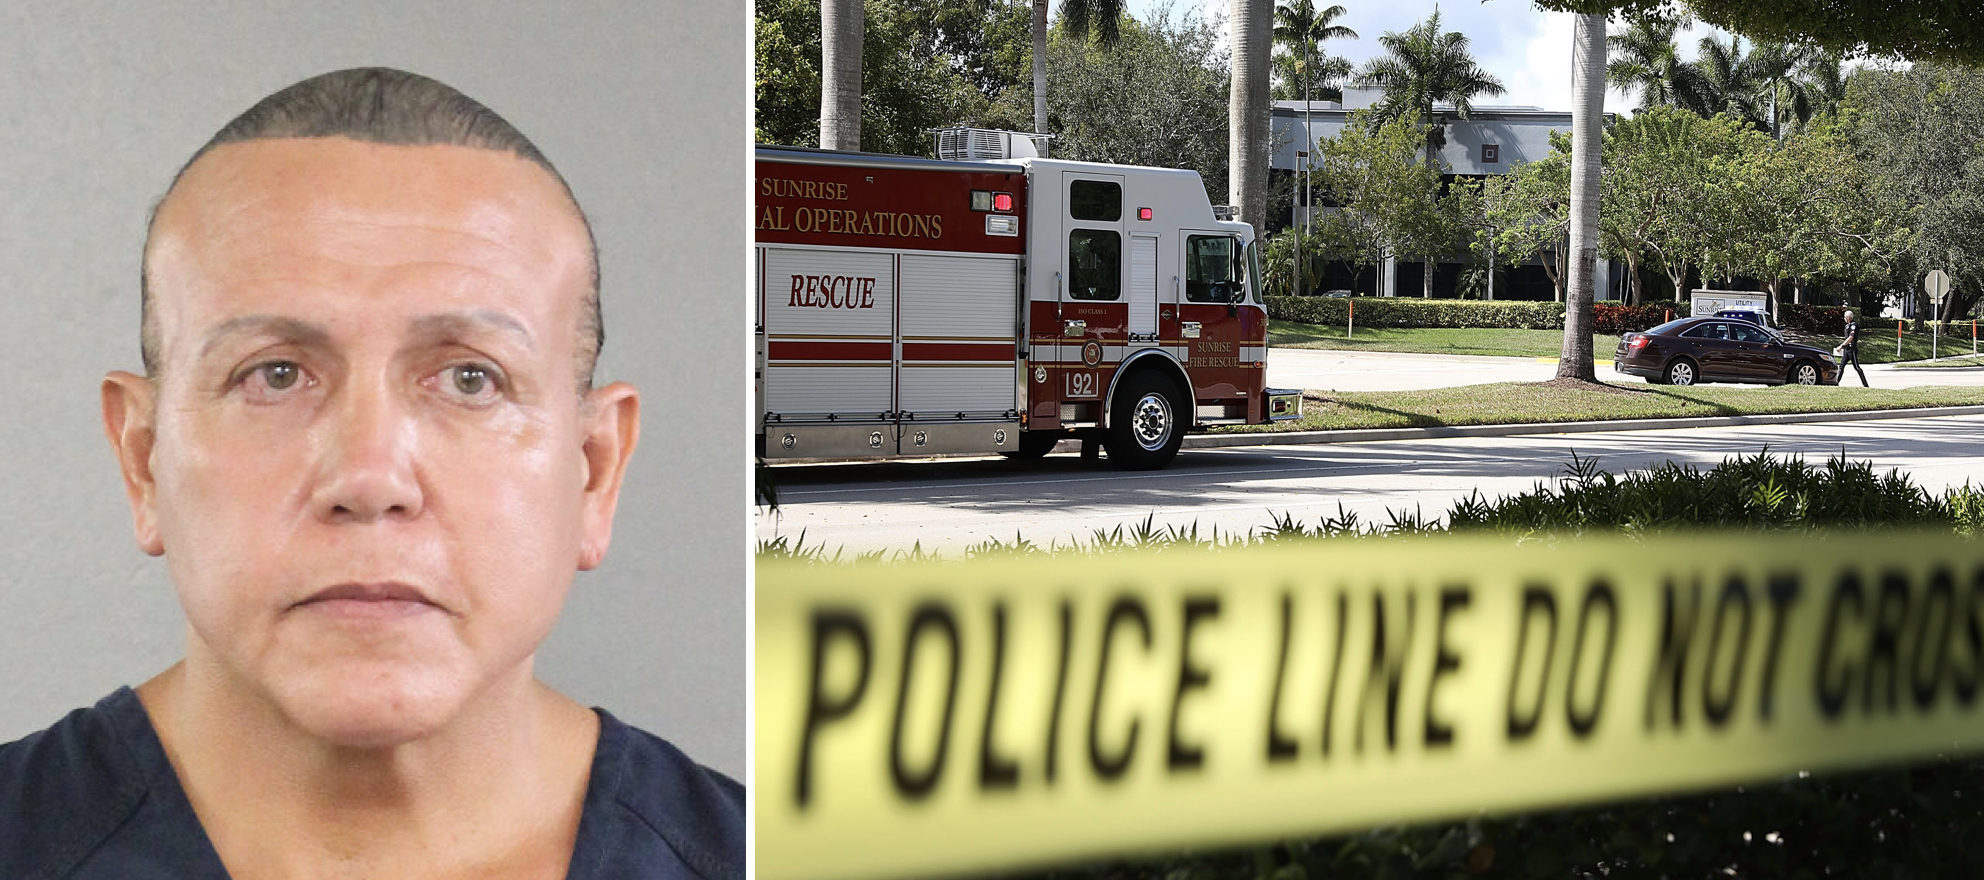 Mail bomb suspect Cesar Altieri Sayoc lost home to foreclosure during crisis